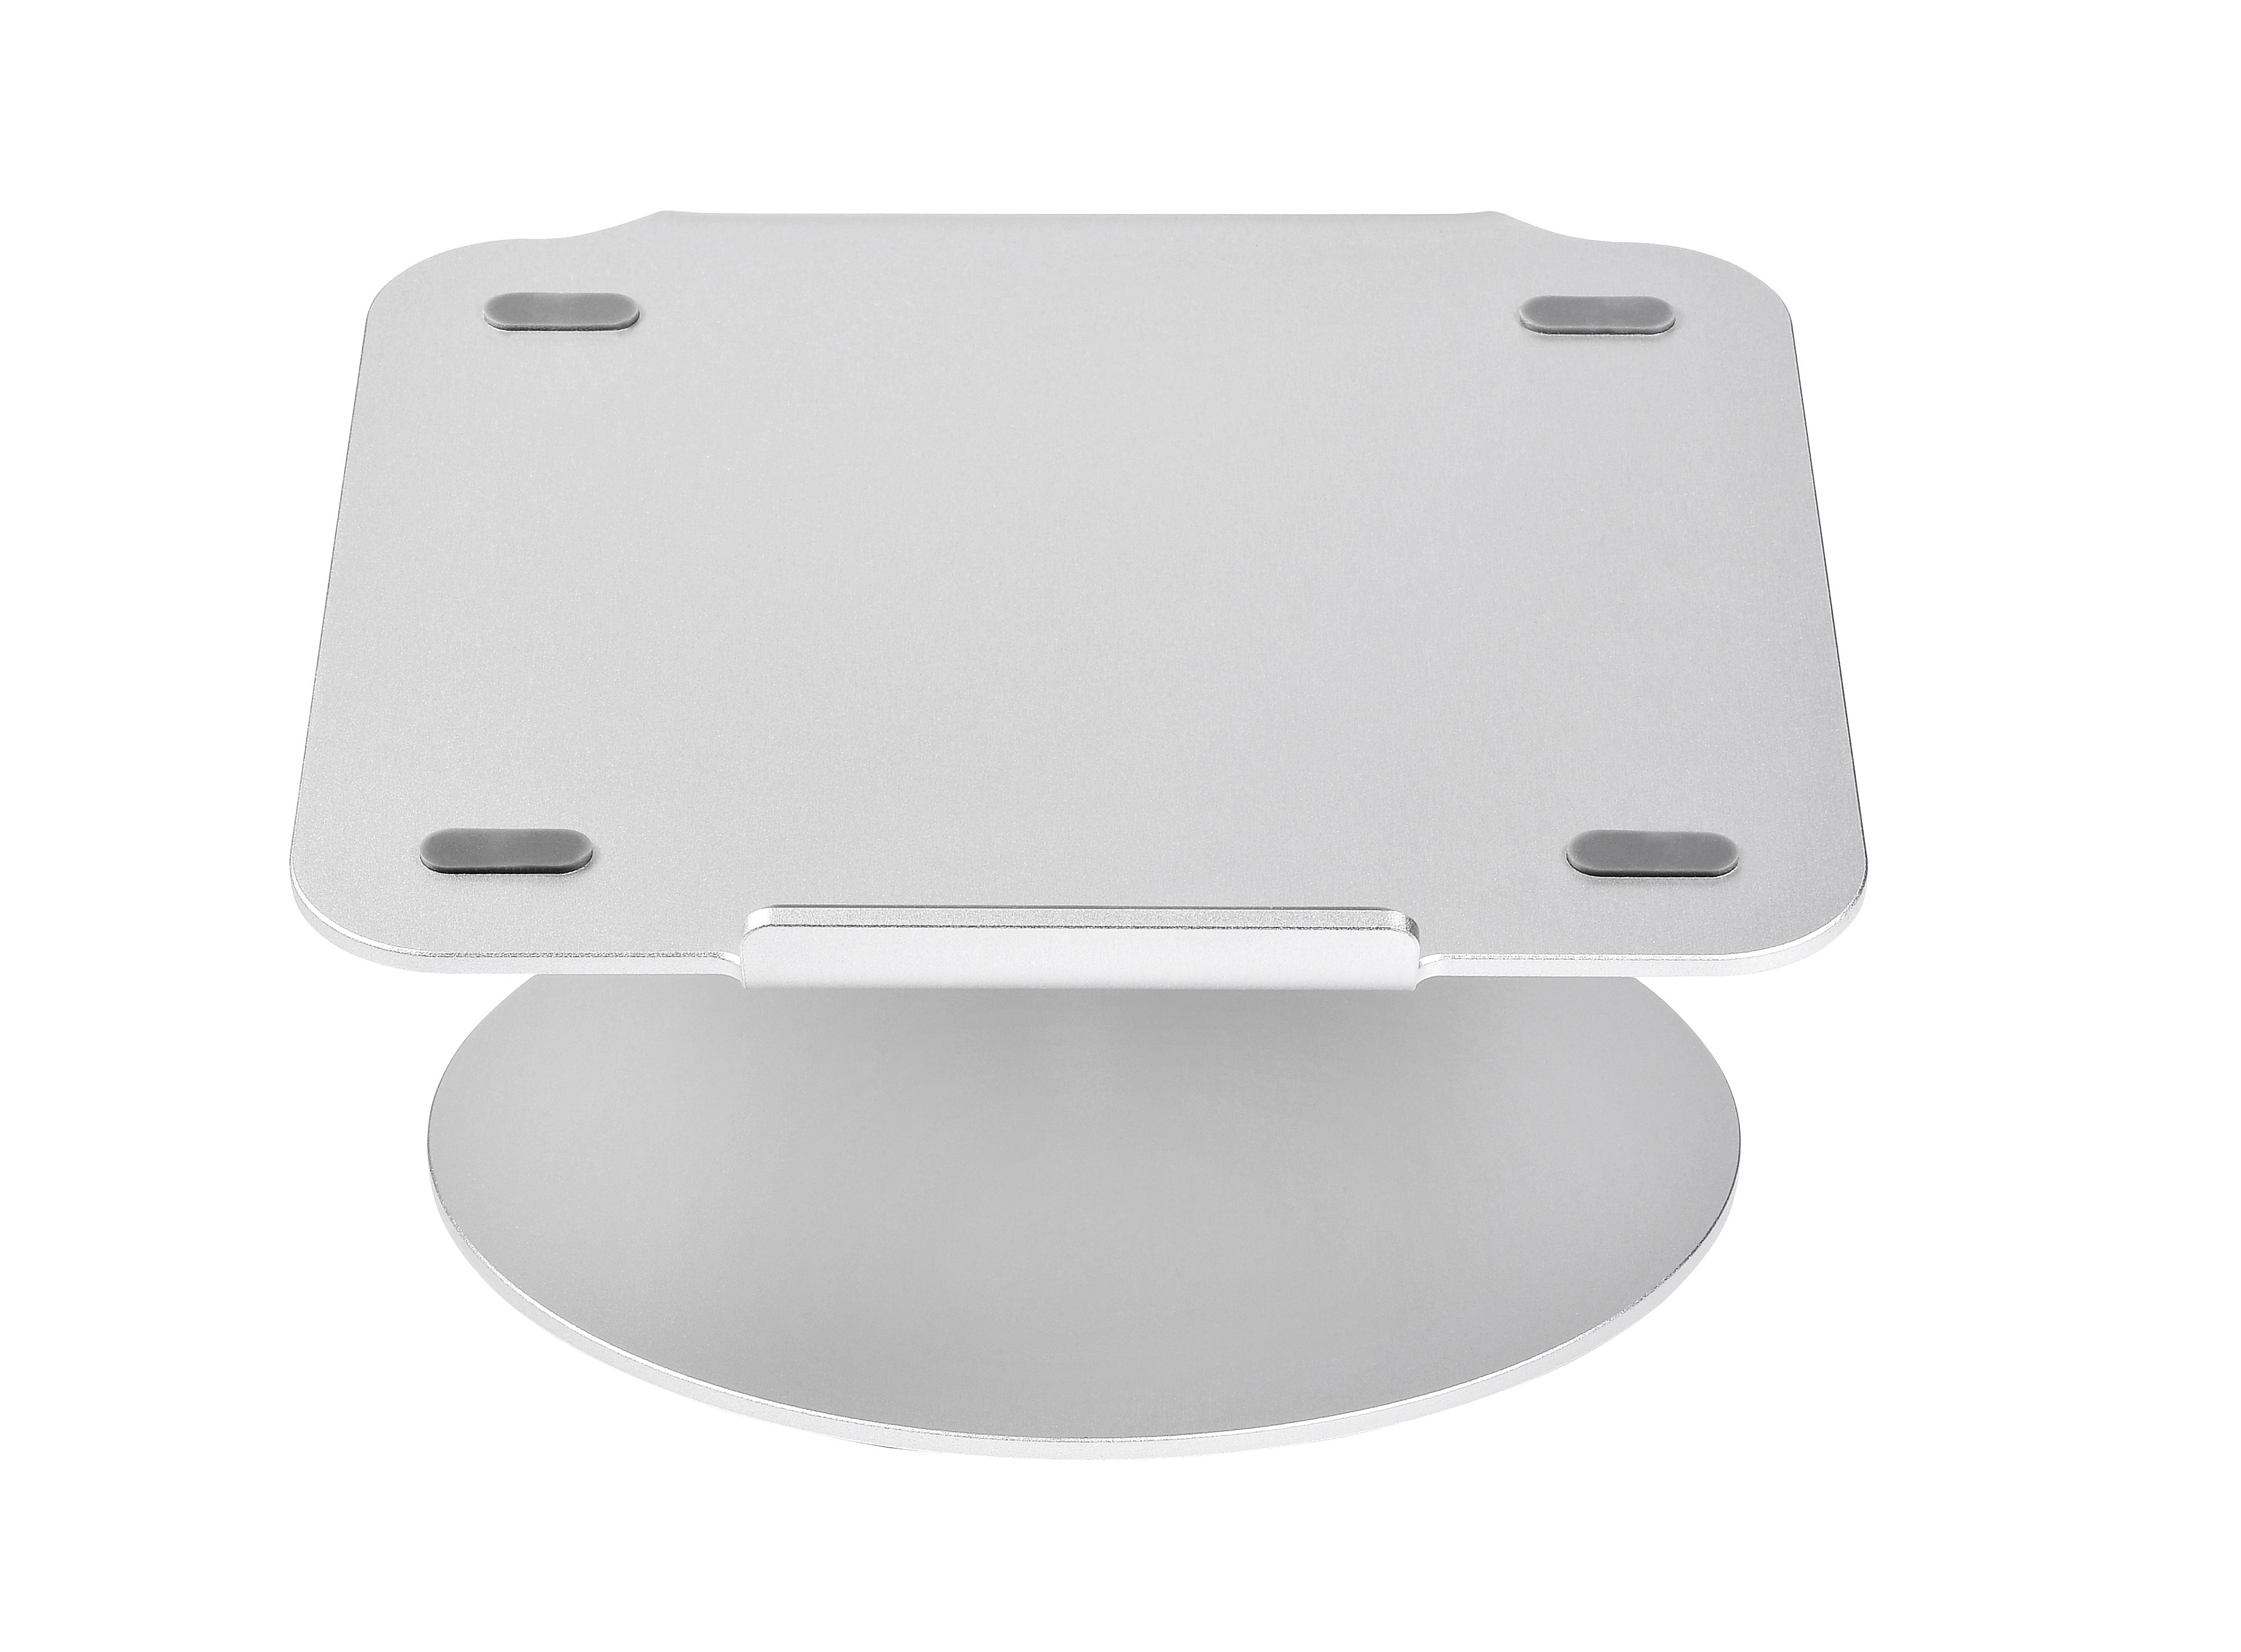 Vorschau: Spire SPUGAP-2S - Notebook-Ständer - Silber - 25,4 cm (10 Zoll) - 43,2 cm (17 Zoll) - Aluminium - 251 mm